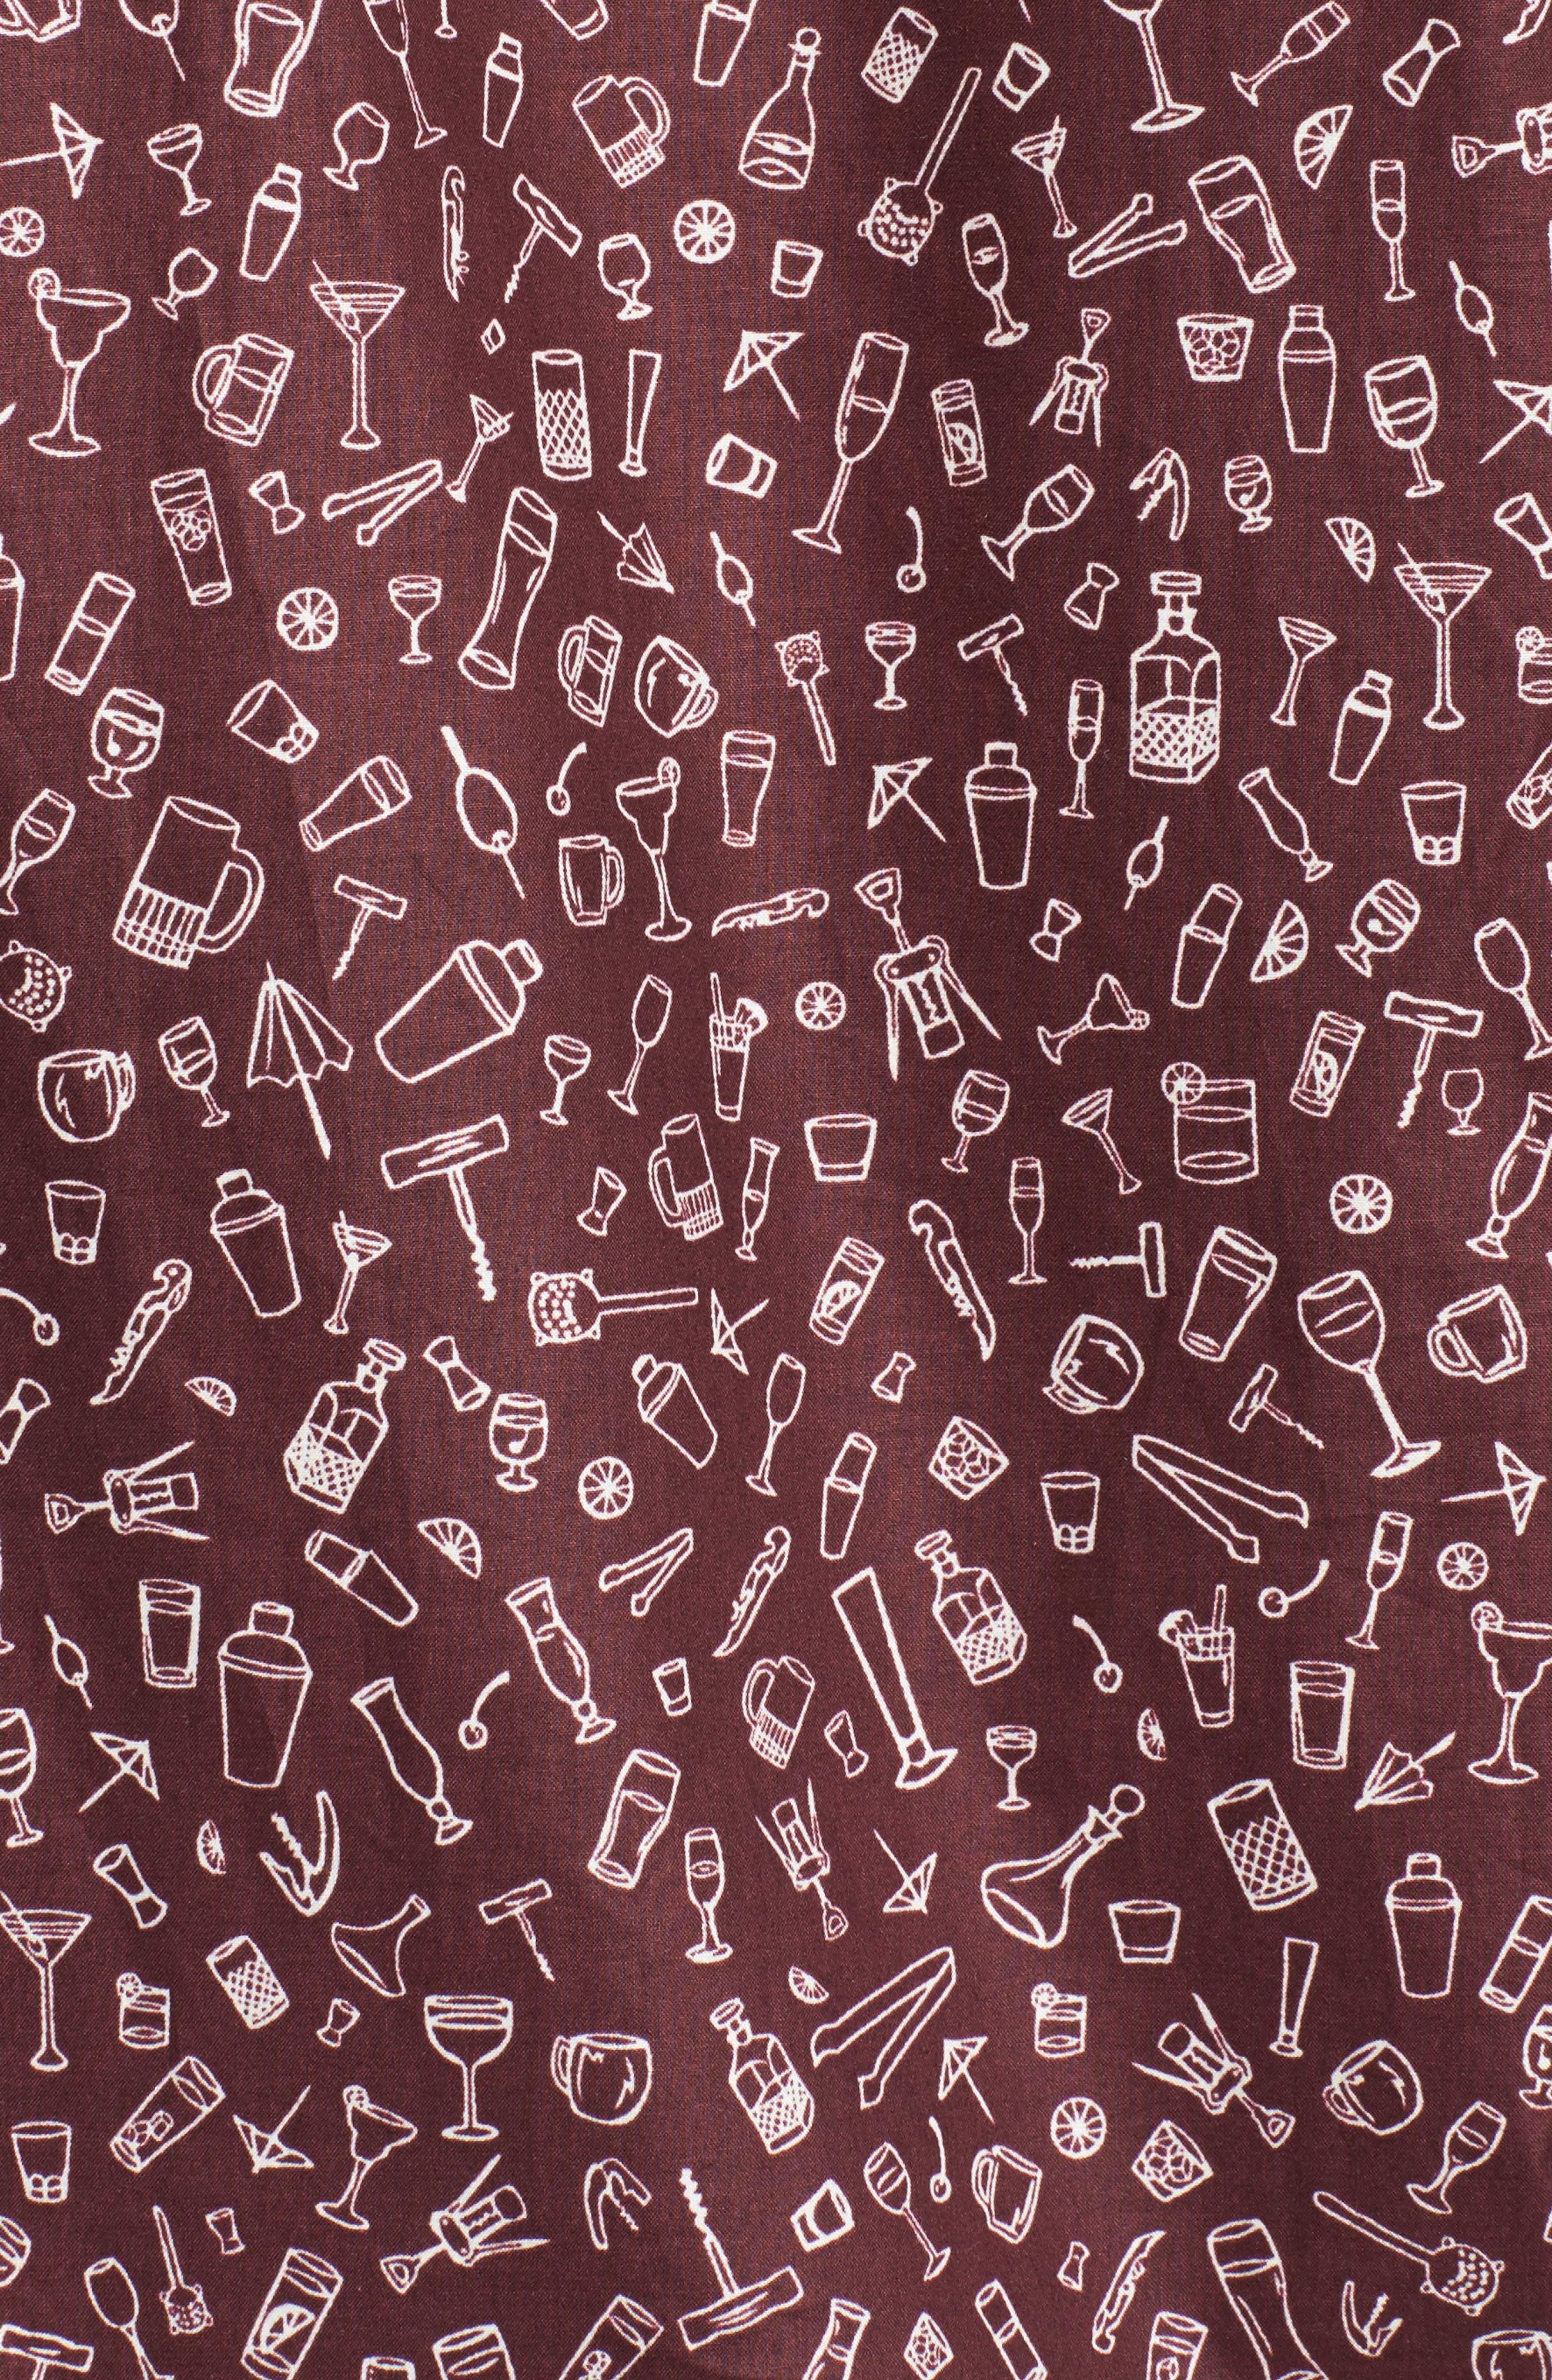 5 PM Slim Fit Camp Shirt,                             Alternate thumbnail 5, color,                             600